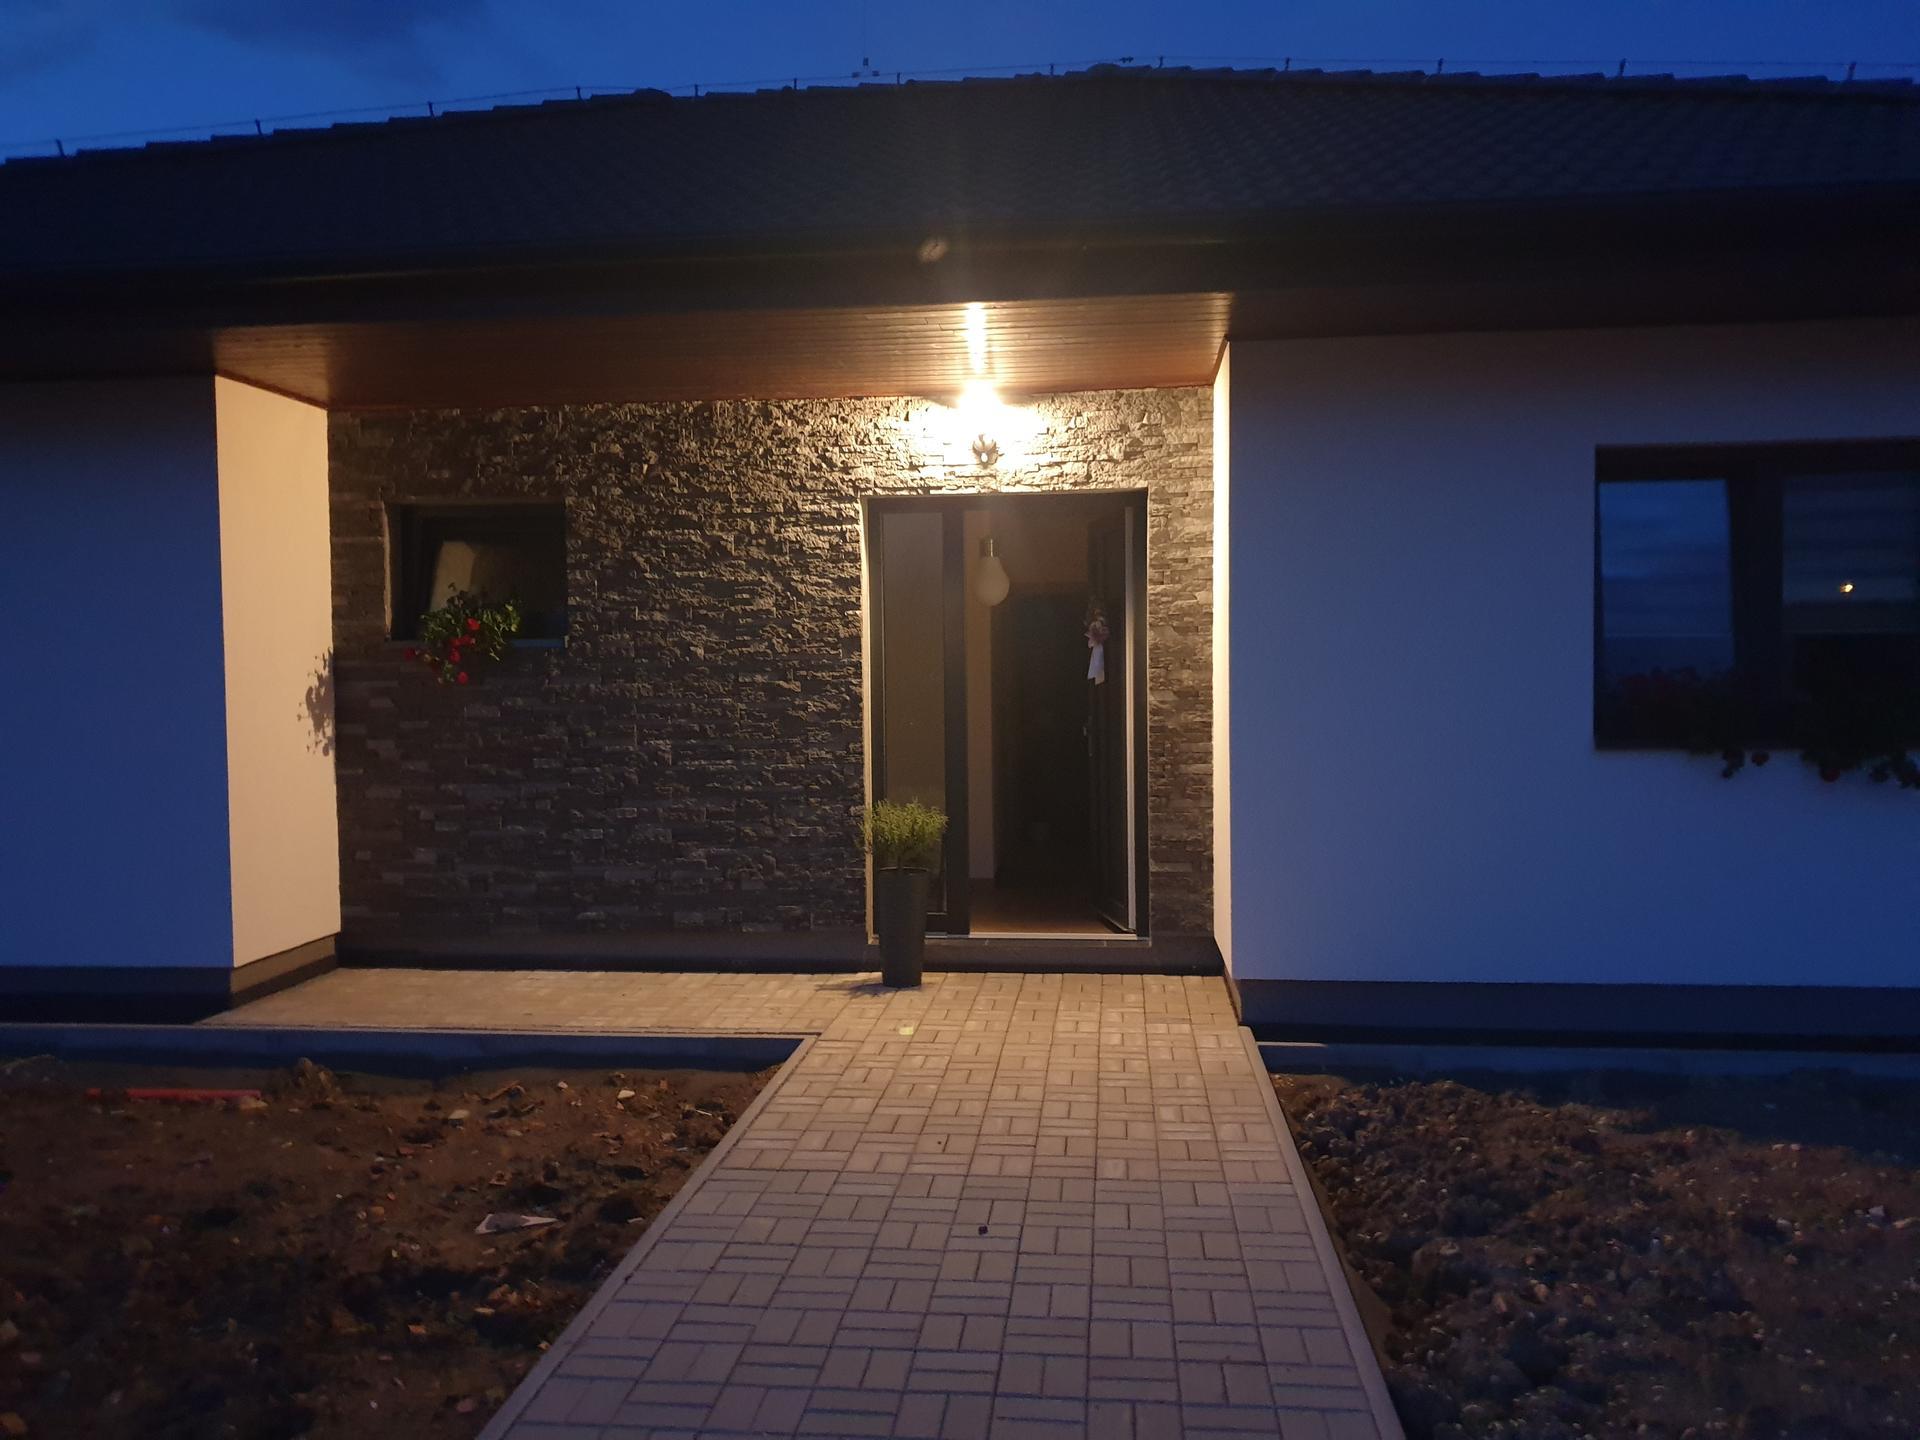 Zahrada a terasa - Obrázek č. 31